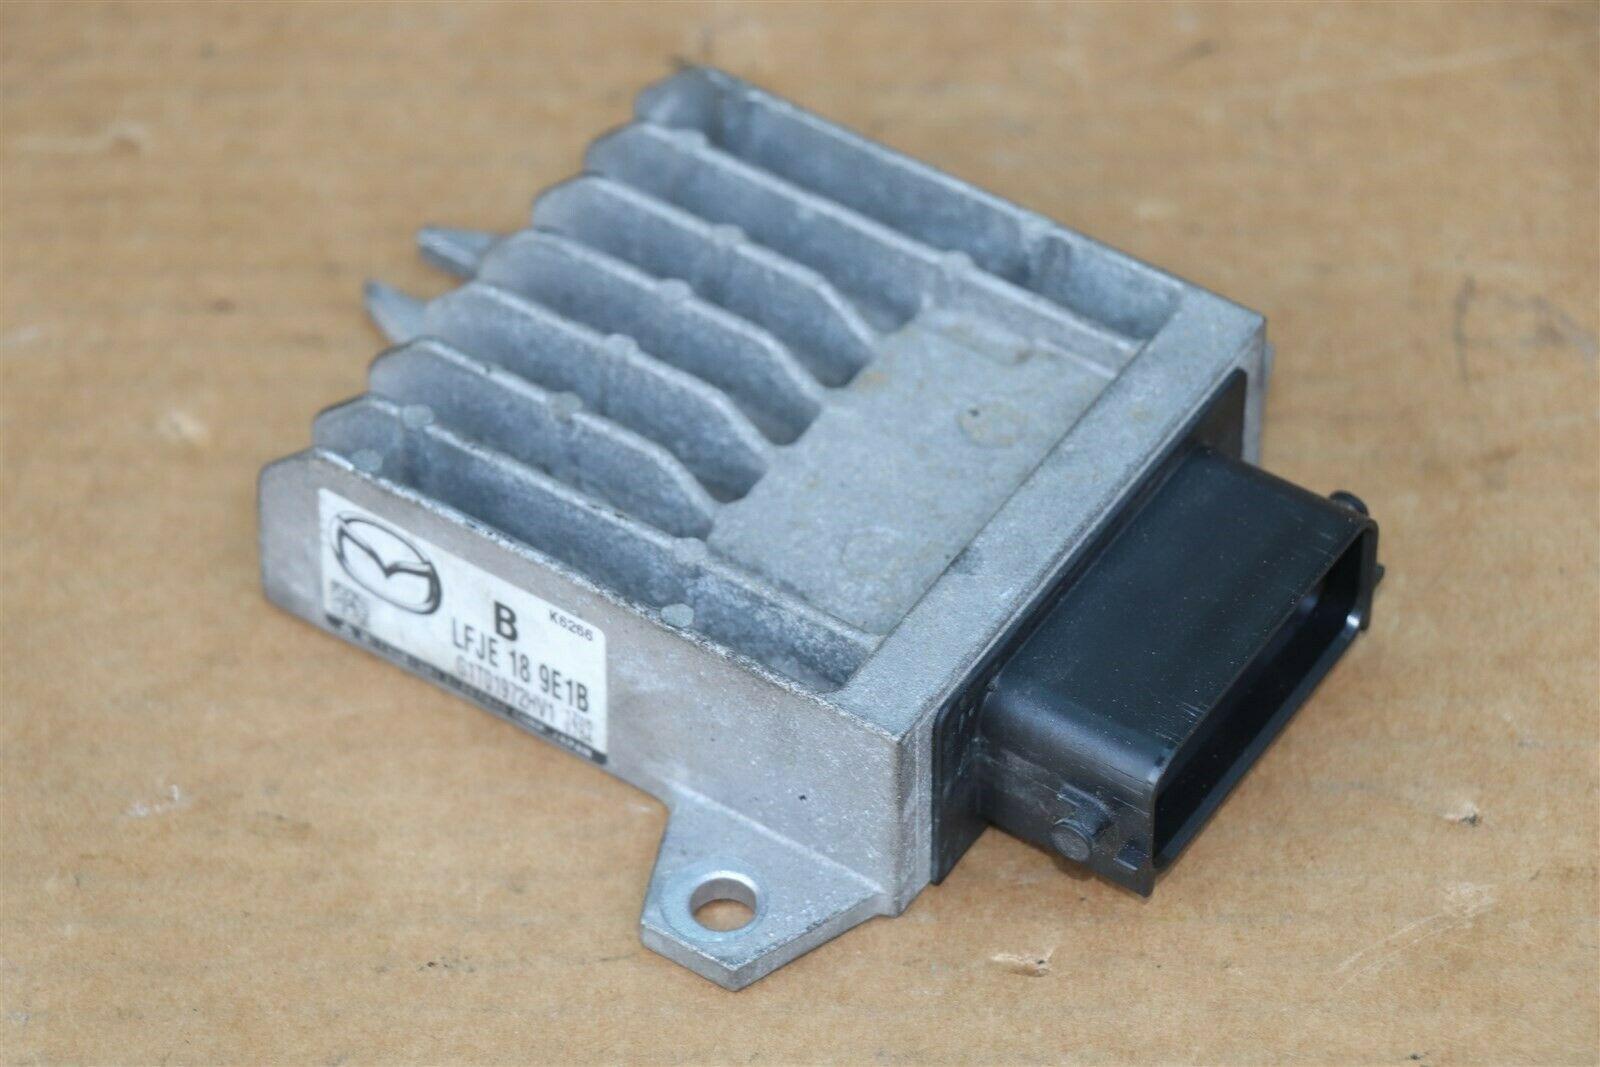 Mazda TCM TCU Trans Transmission Control Module Computer Shift Unit LFJE 18 9E1B